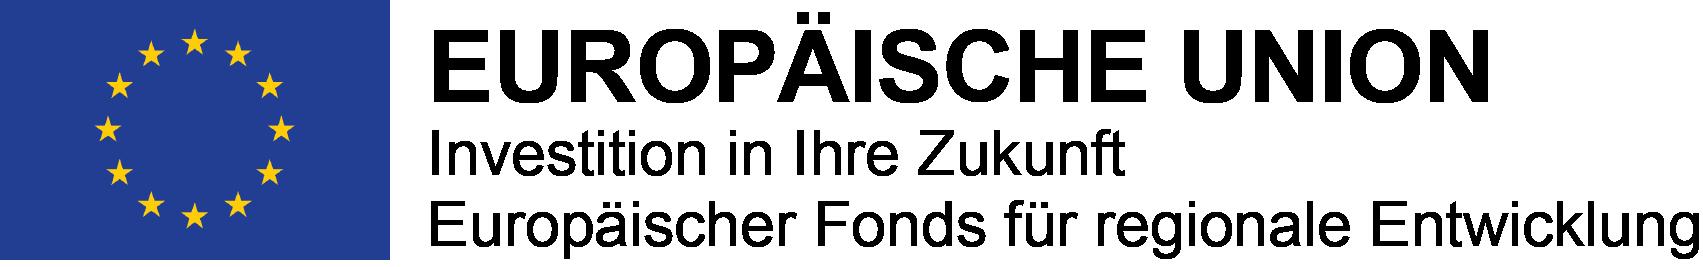 EFRE Logo Horizontal.png